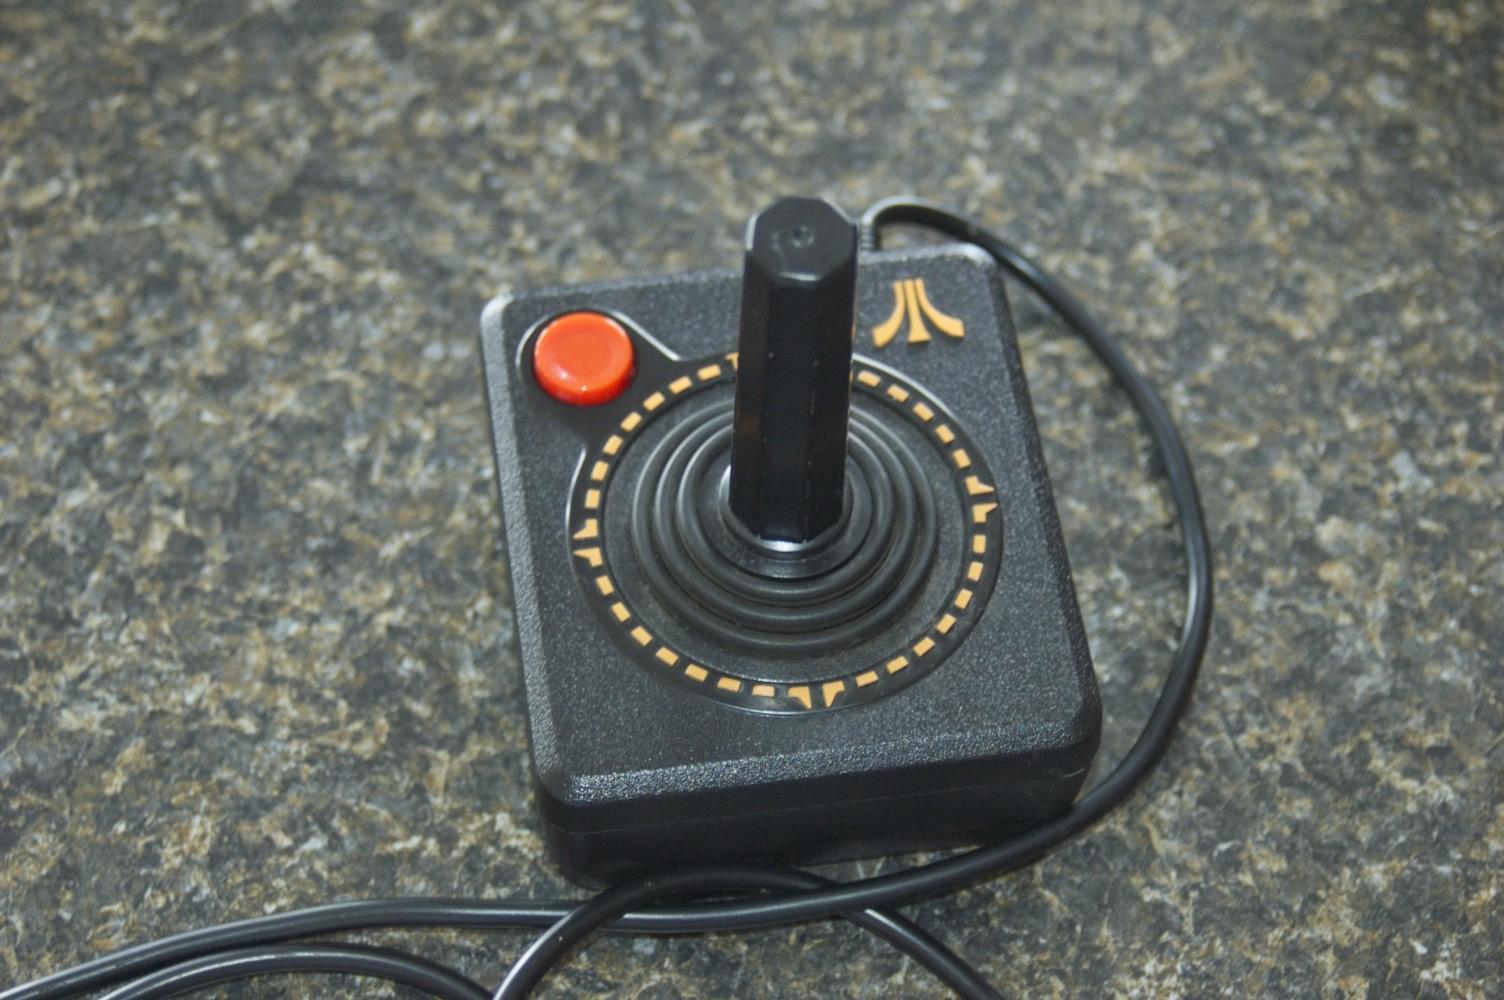 Picture of Disassemble the Atari Joystick